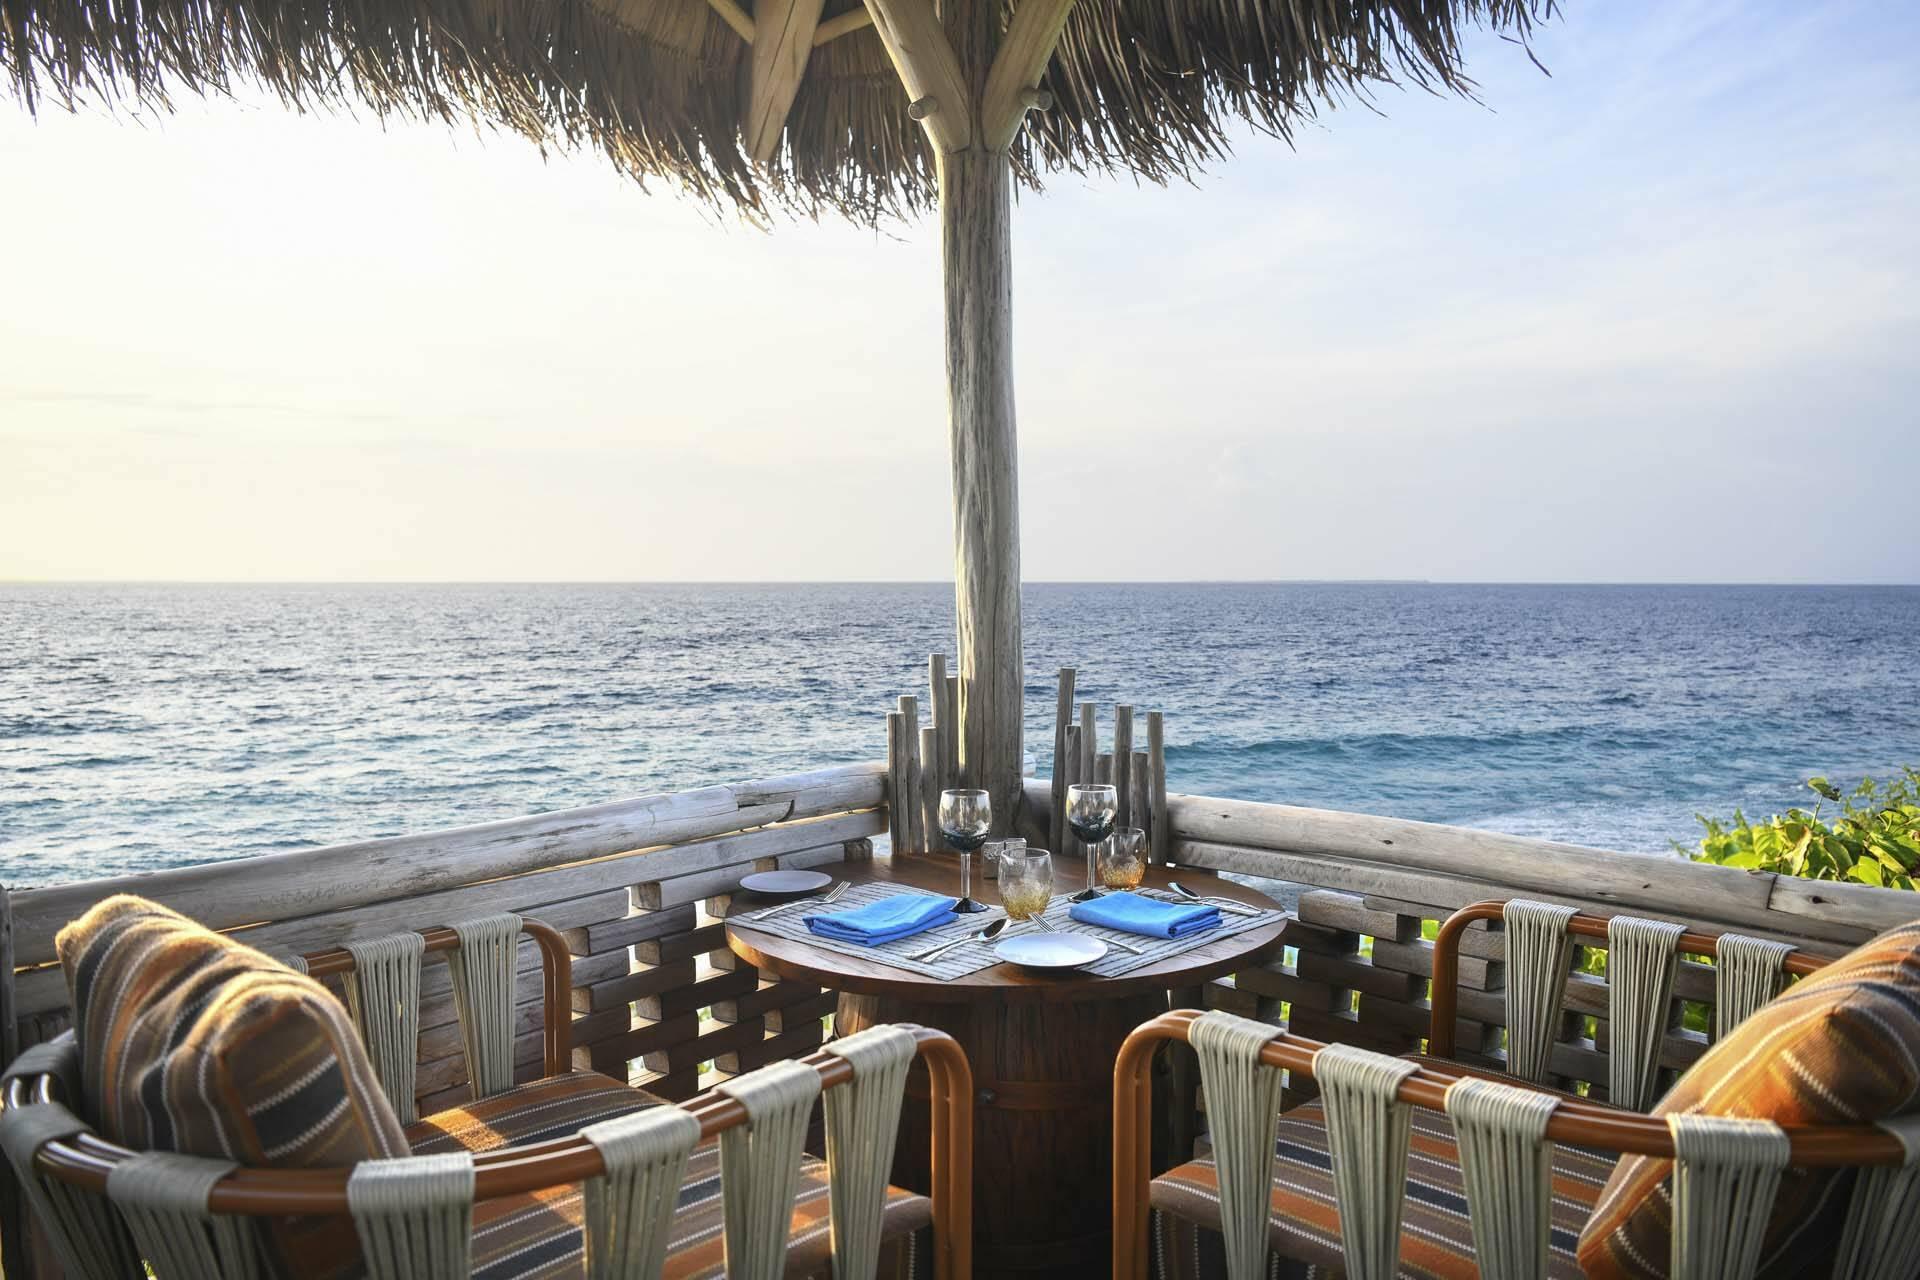 JW Marriott Maldives spot restaurant